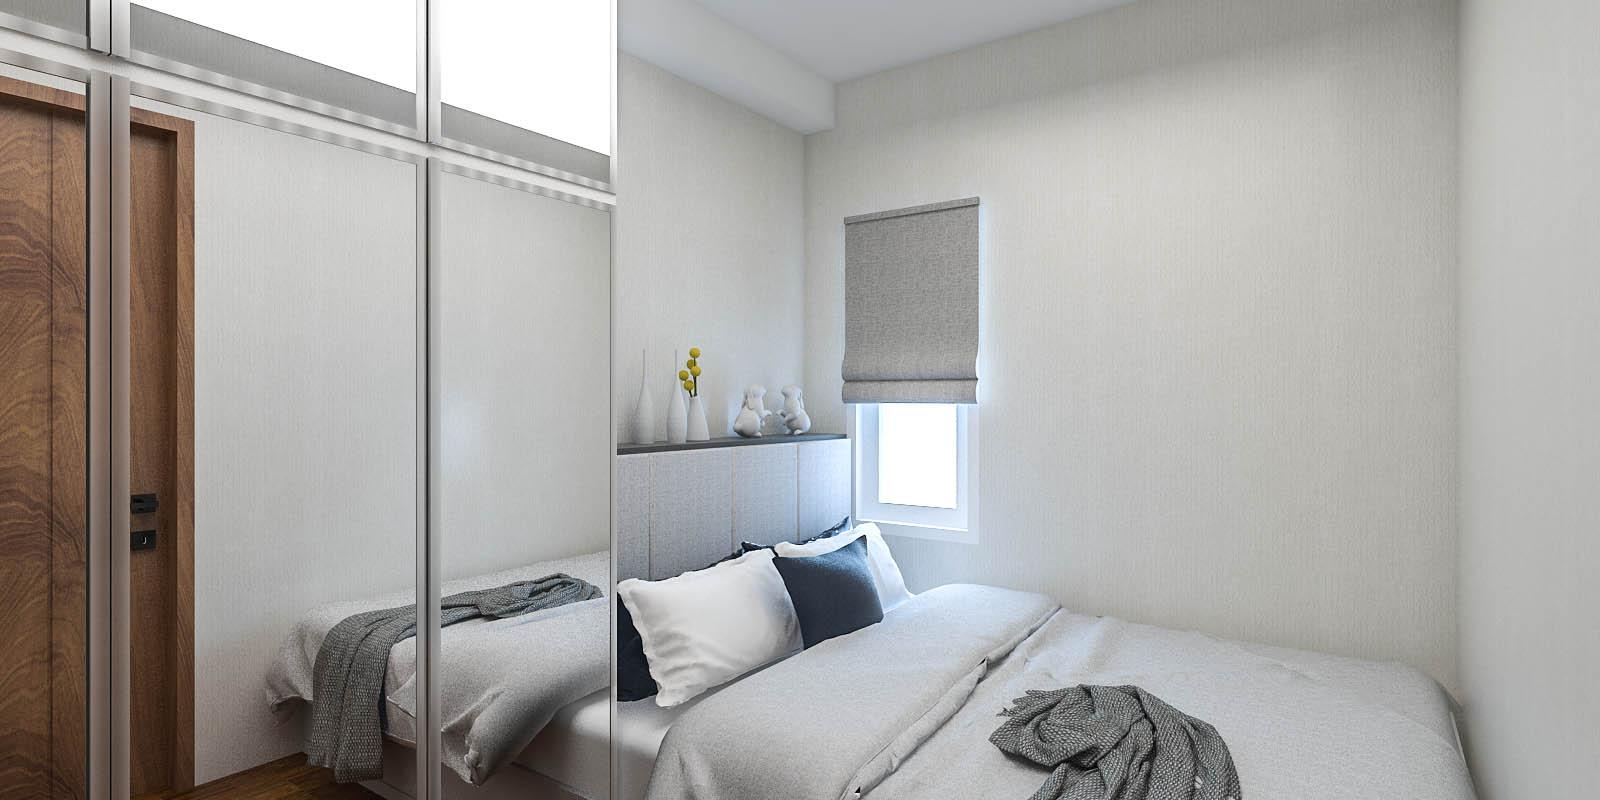 Kumpulan desain kamar tidur minimalis apartemen for Dekor kamar tidur hotel